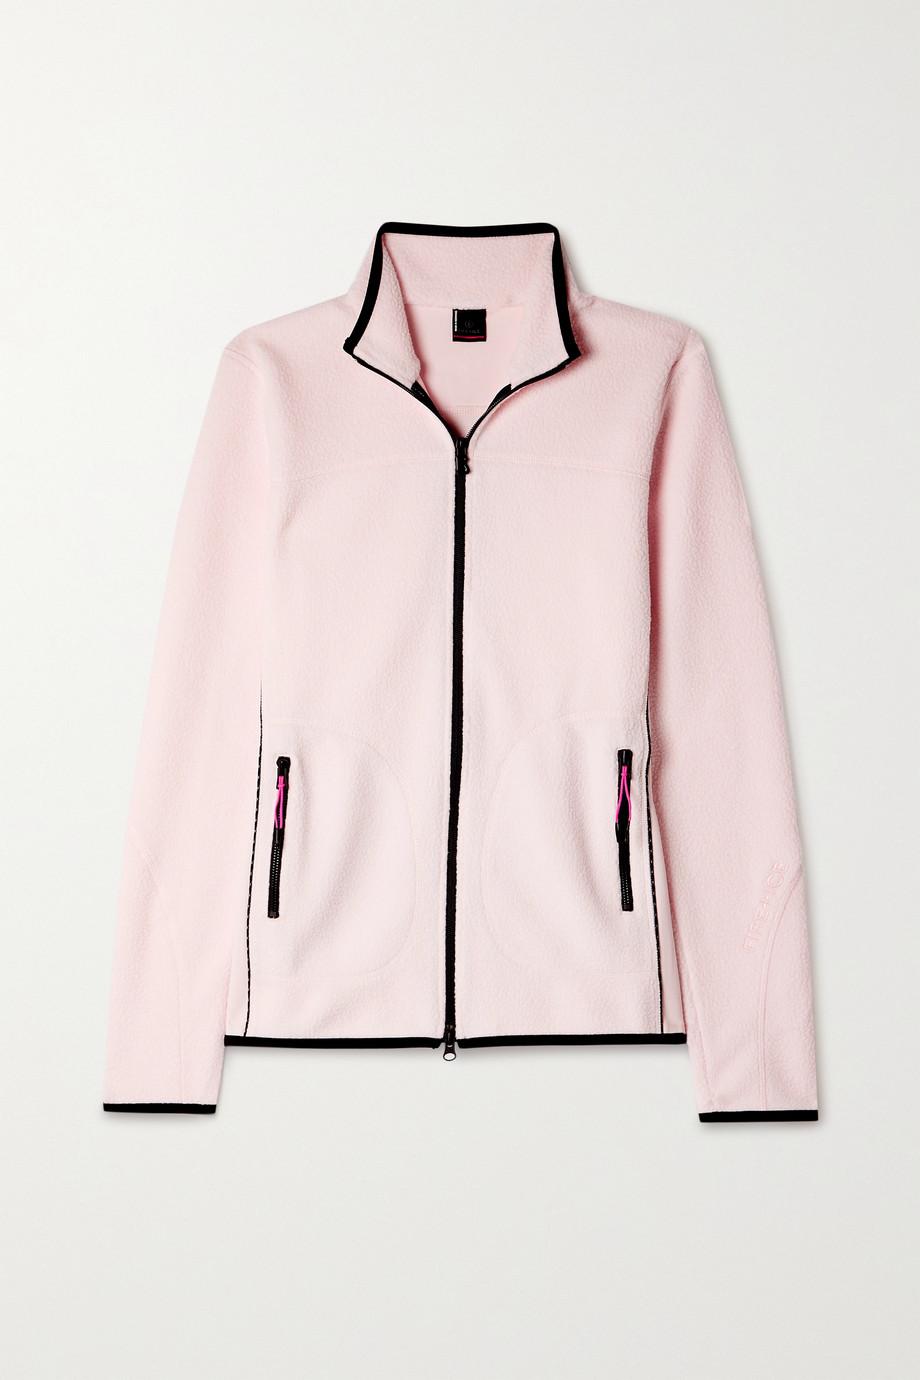 BOGNER FIRE+ICE Gilda jersey-trimmed fleece jacket